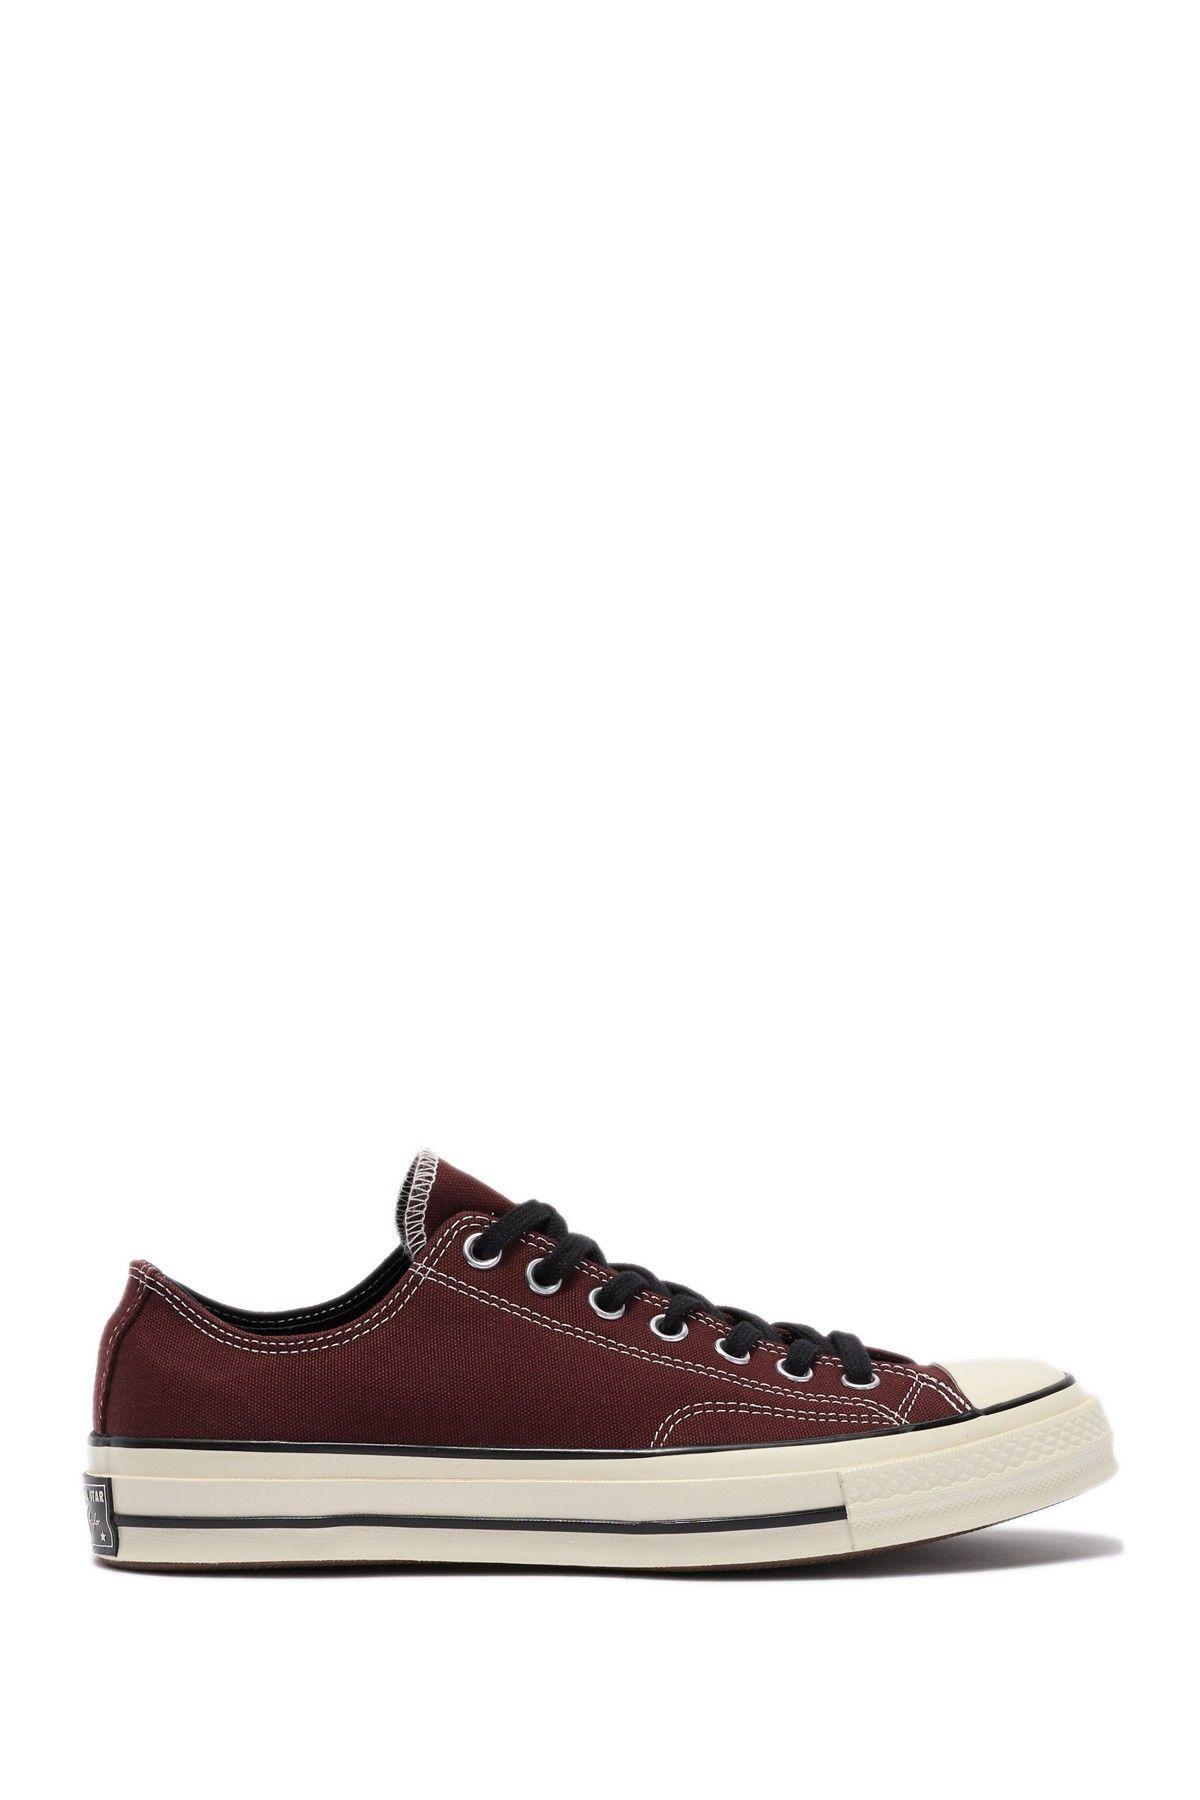 Converse | Chuck Taylor All Star 70 Ox Barkroot Sneaker